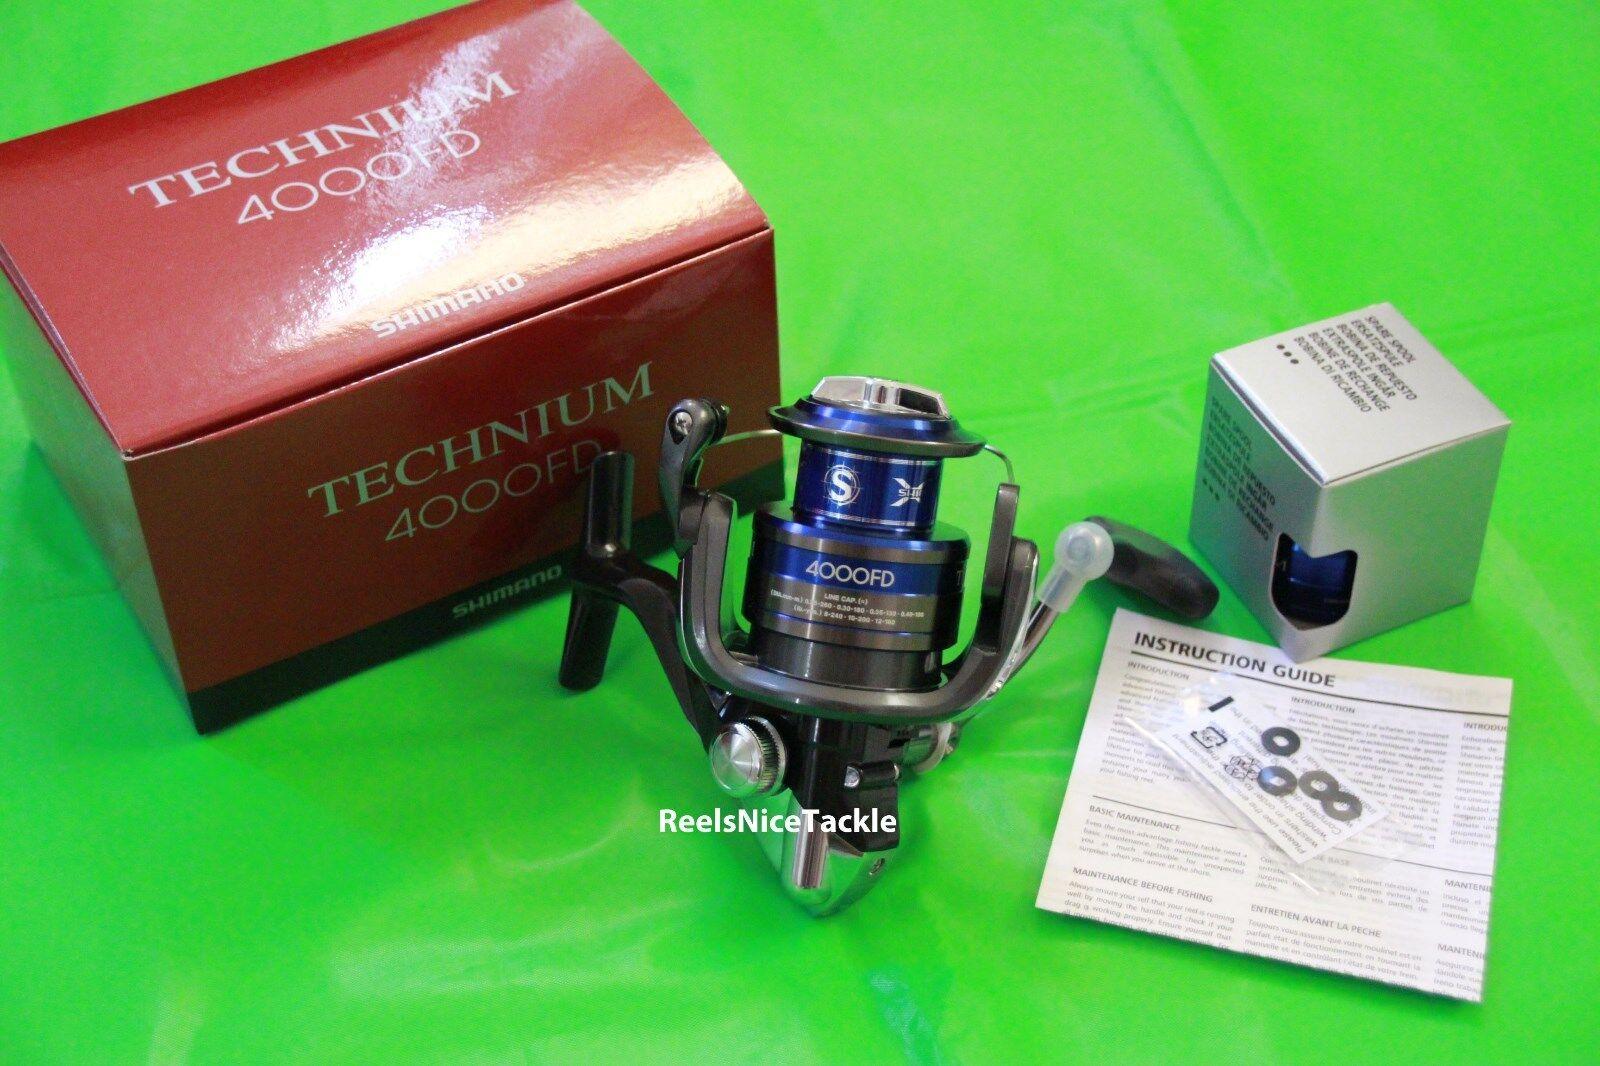 NIB Shimano Technium 4000 FD Spinning Reel spare TEC4000FD plus spare Reel spool FREE 3 DAY 6fa0a2